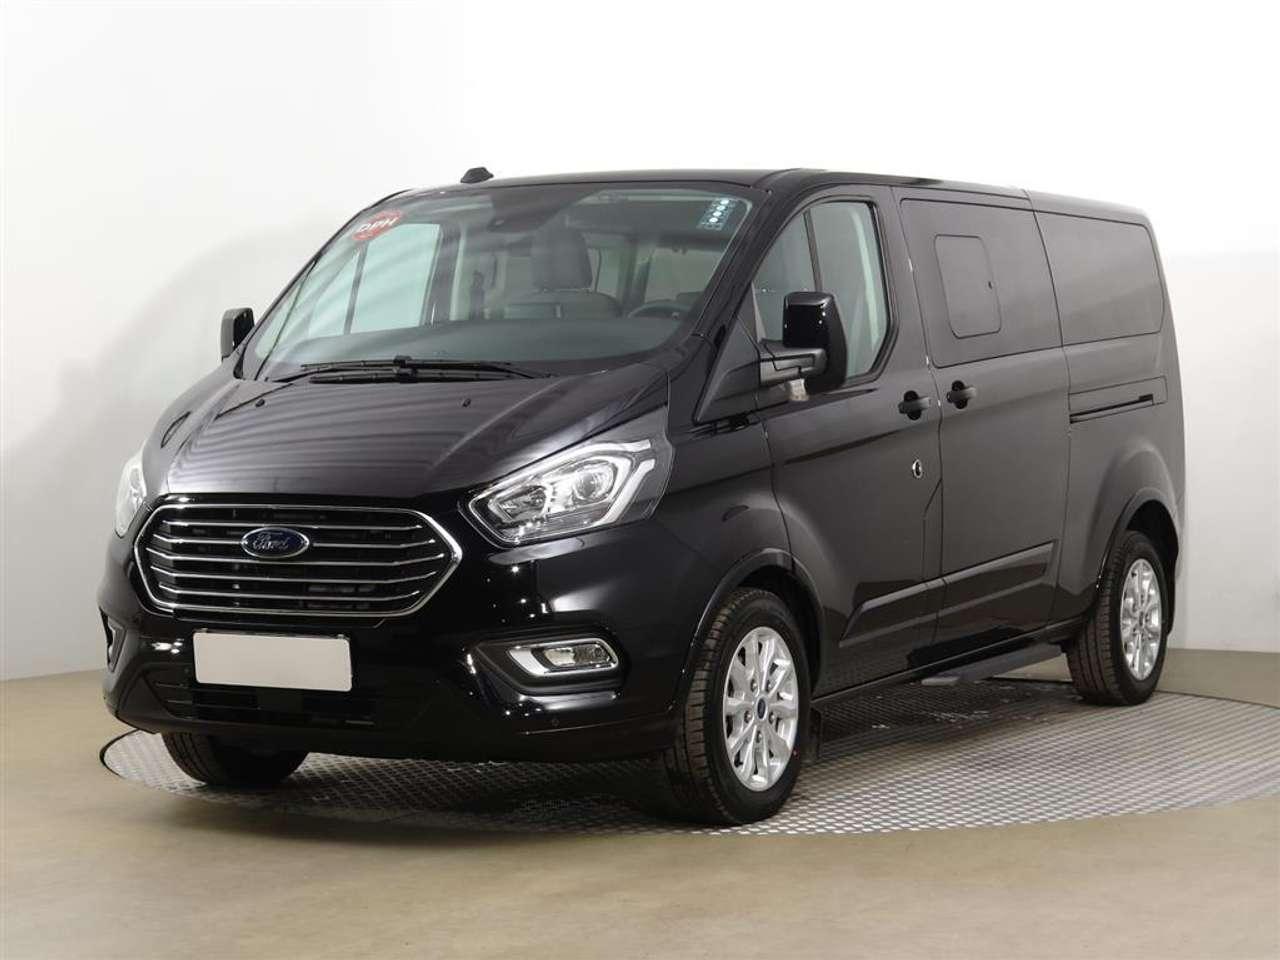 Ford Tourneo Custom 320 L2H1 Titanium NAVI GARANTIE 01/2026 od 200tkm